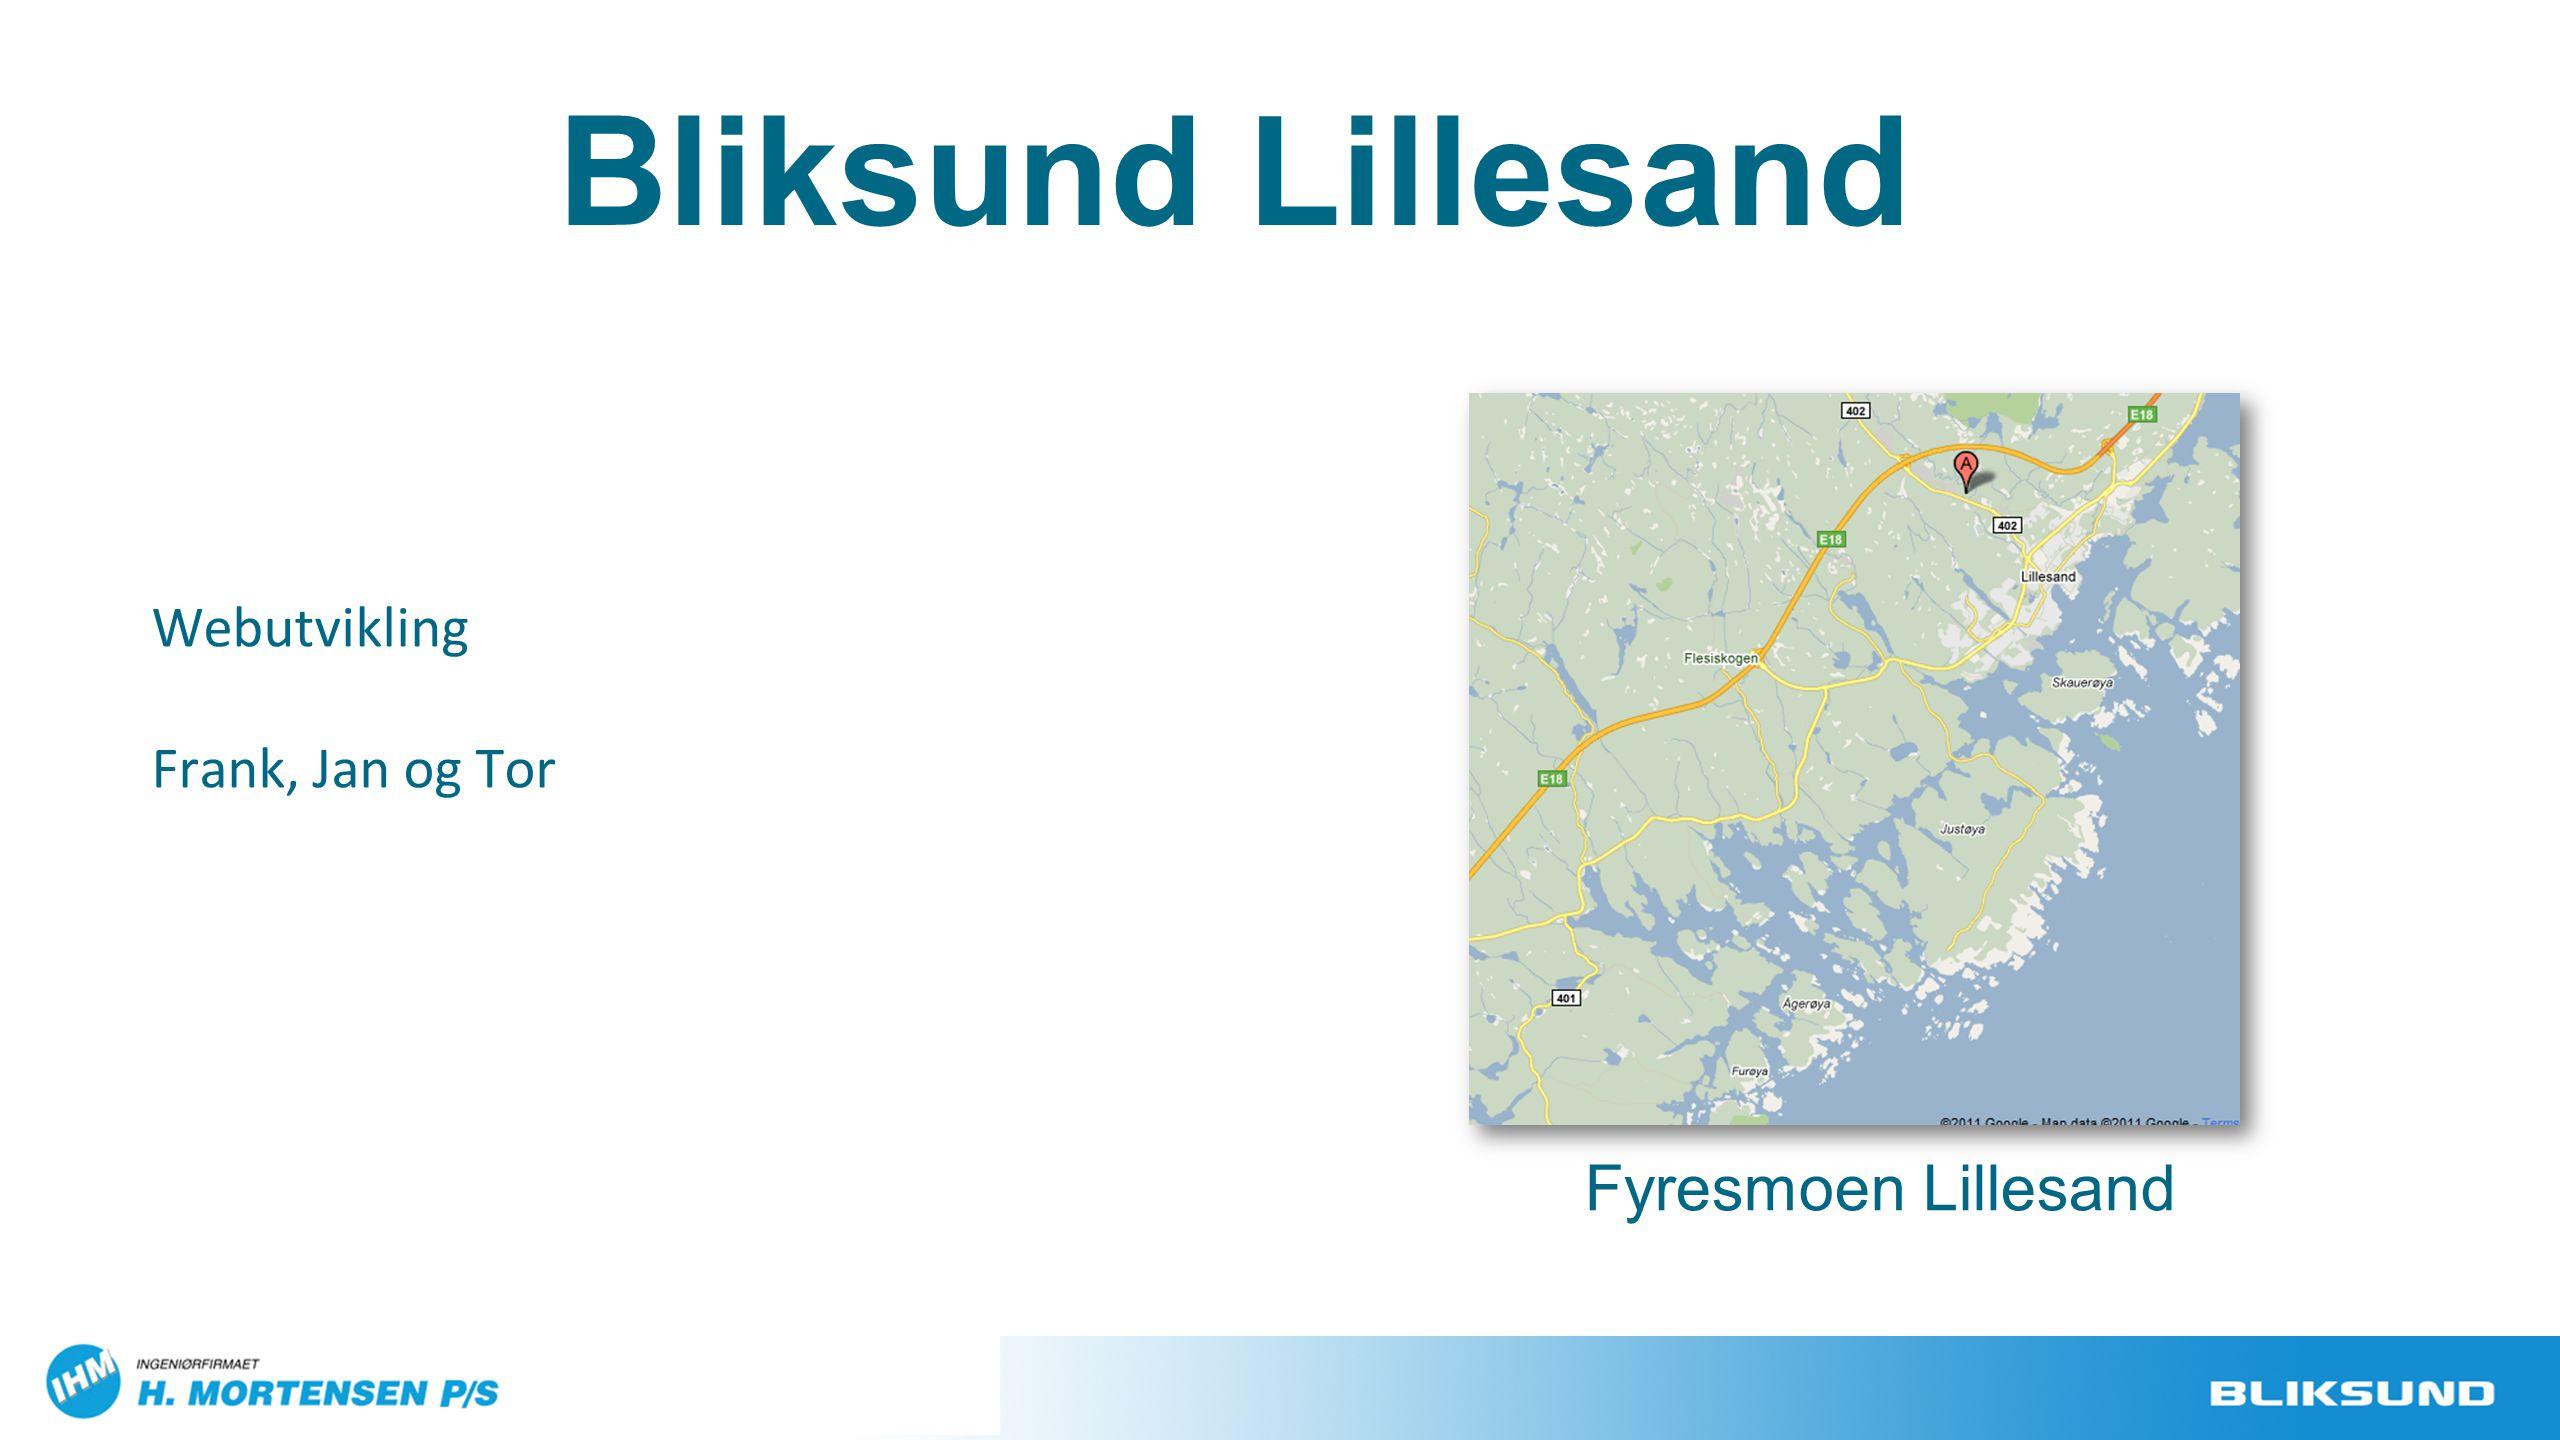 Bliksund Lillesand Webutvikling Frank, Jan og Tor Fyresmoen Lillesand